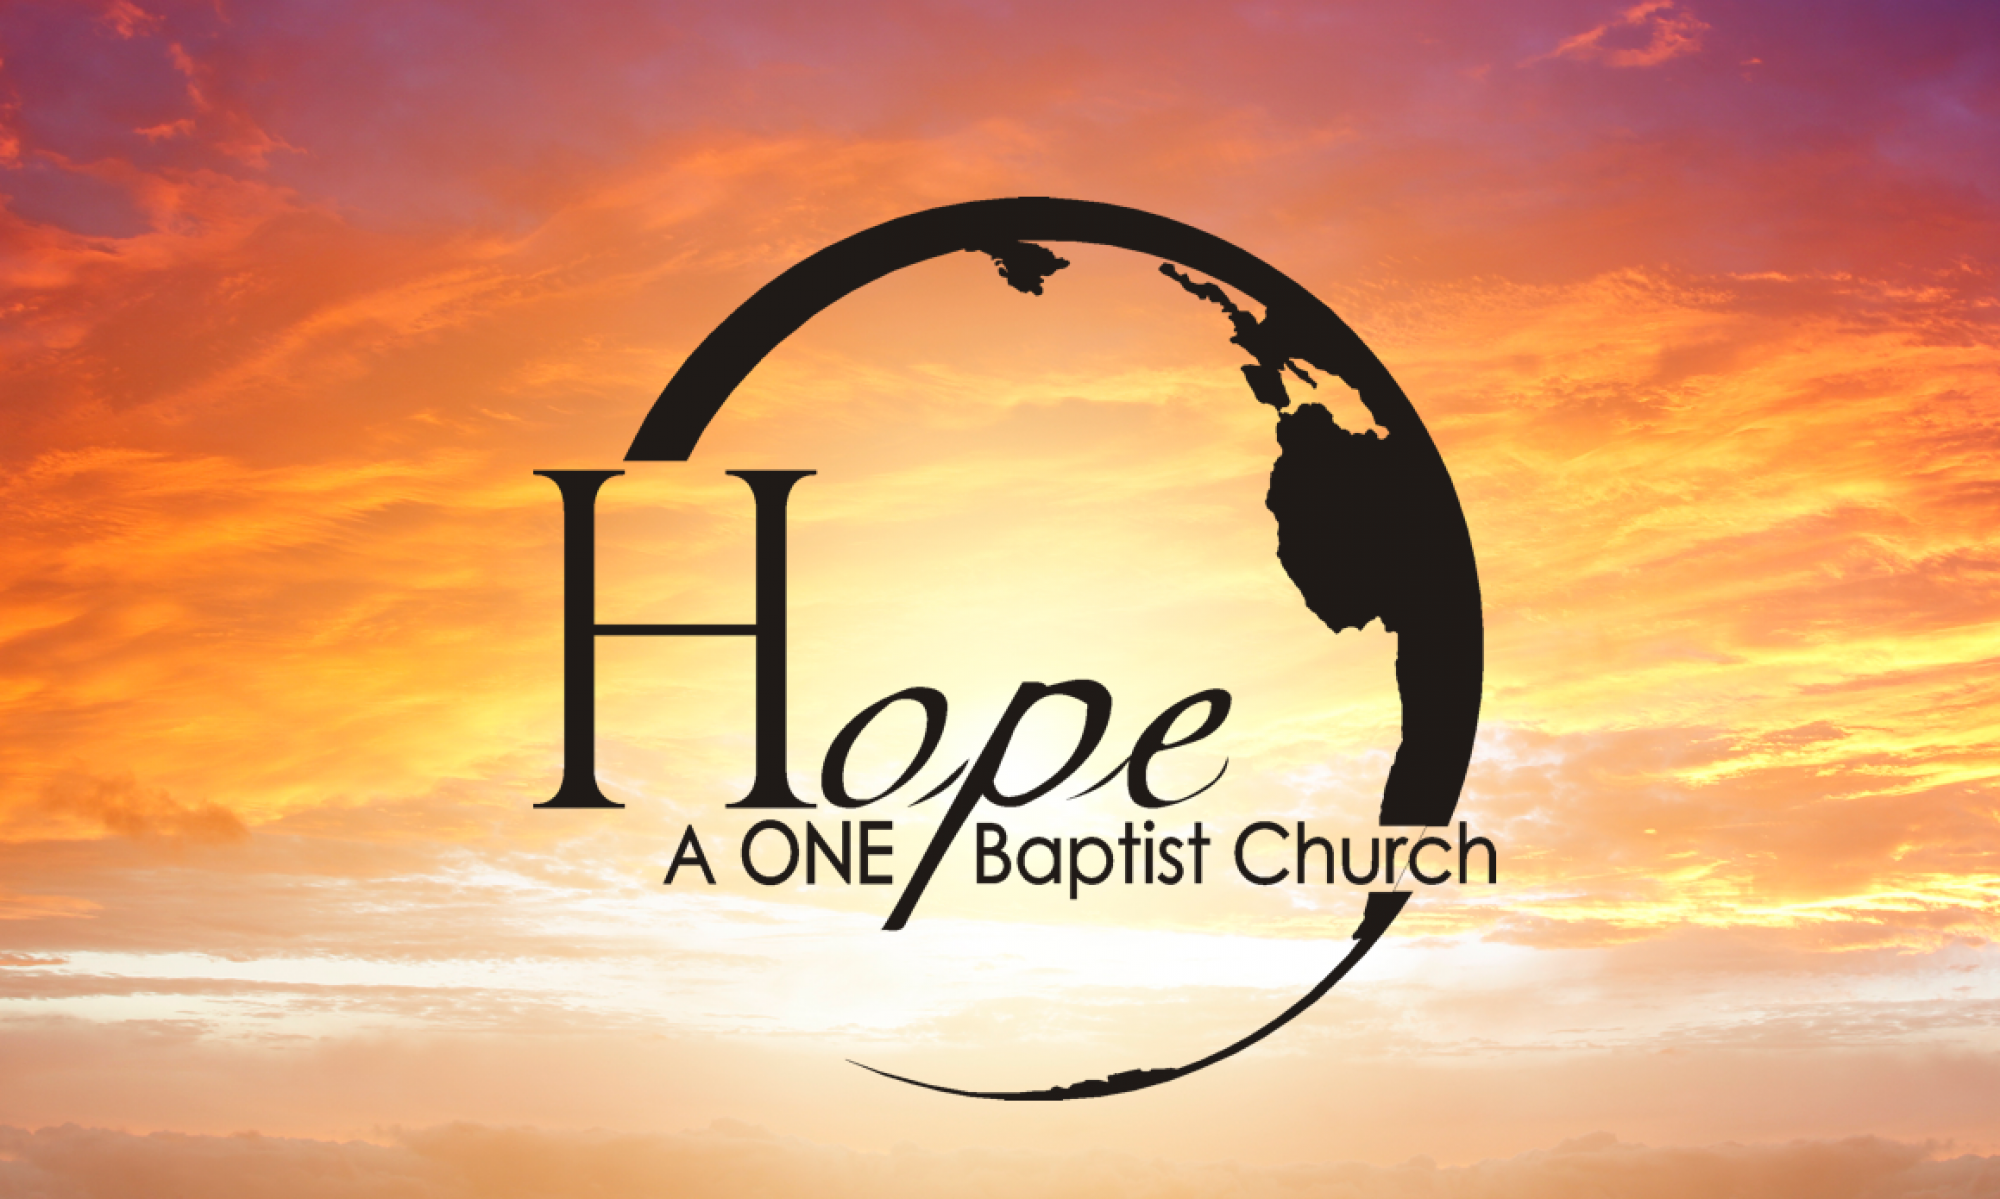 HOPE Baptist